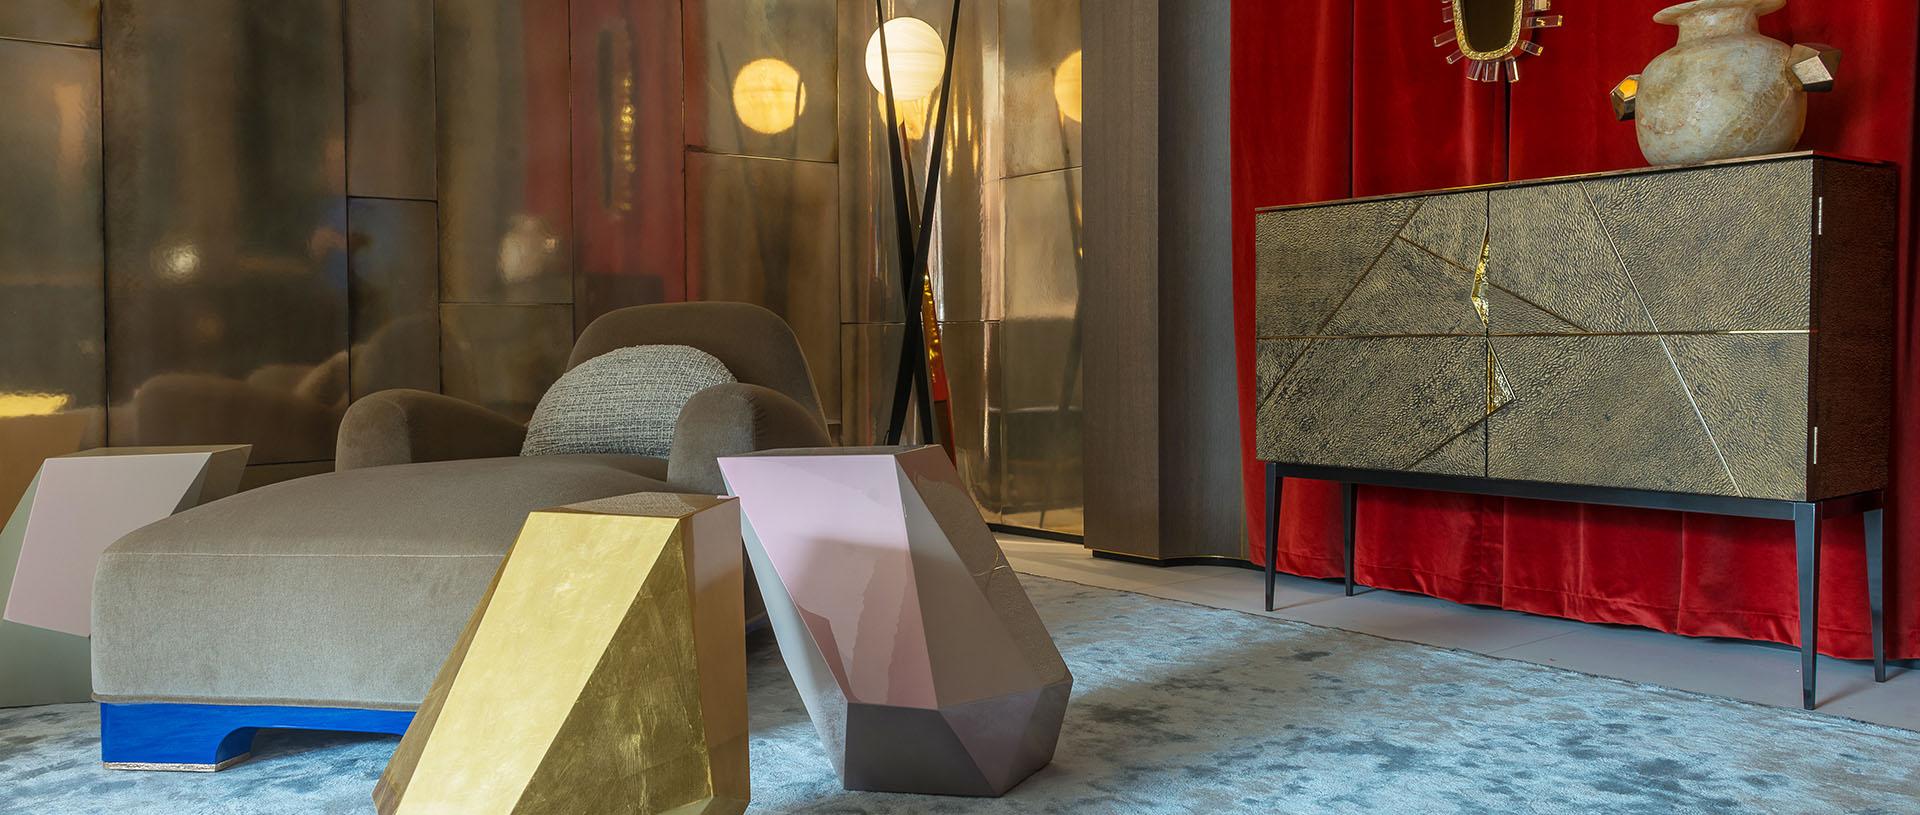 Achille salvagni bespoke furniture unique objects and